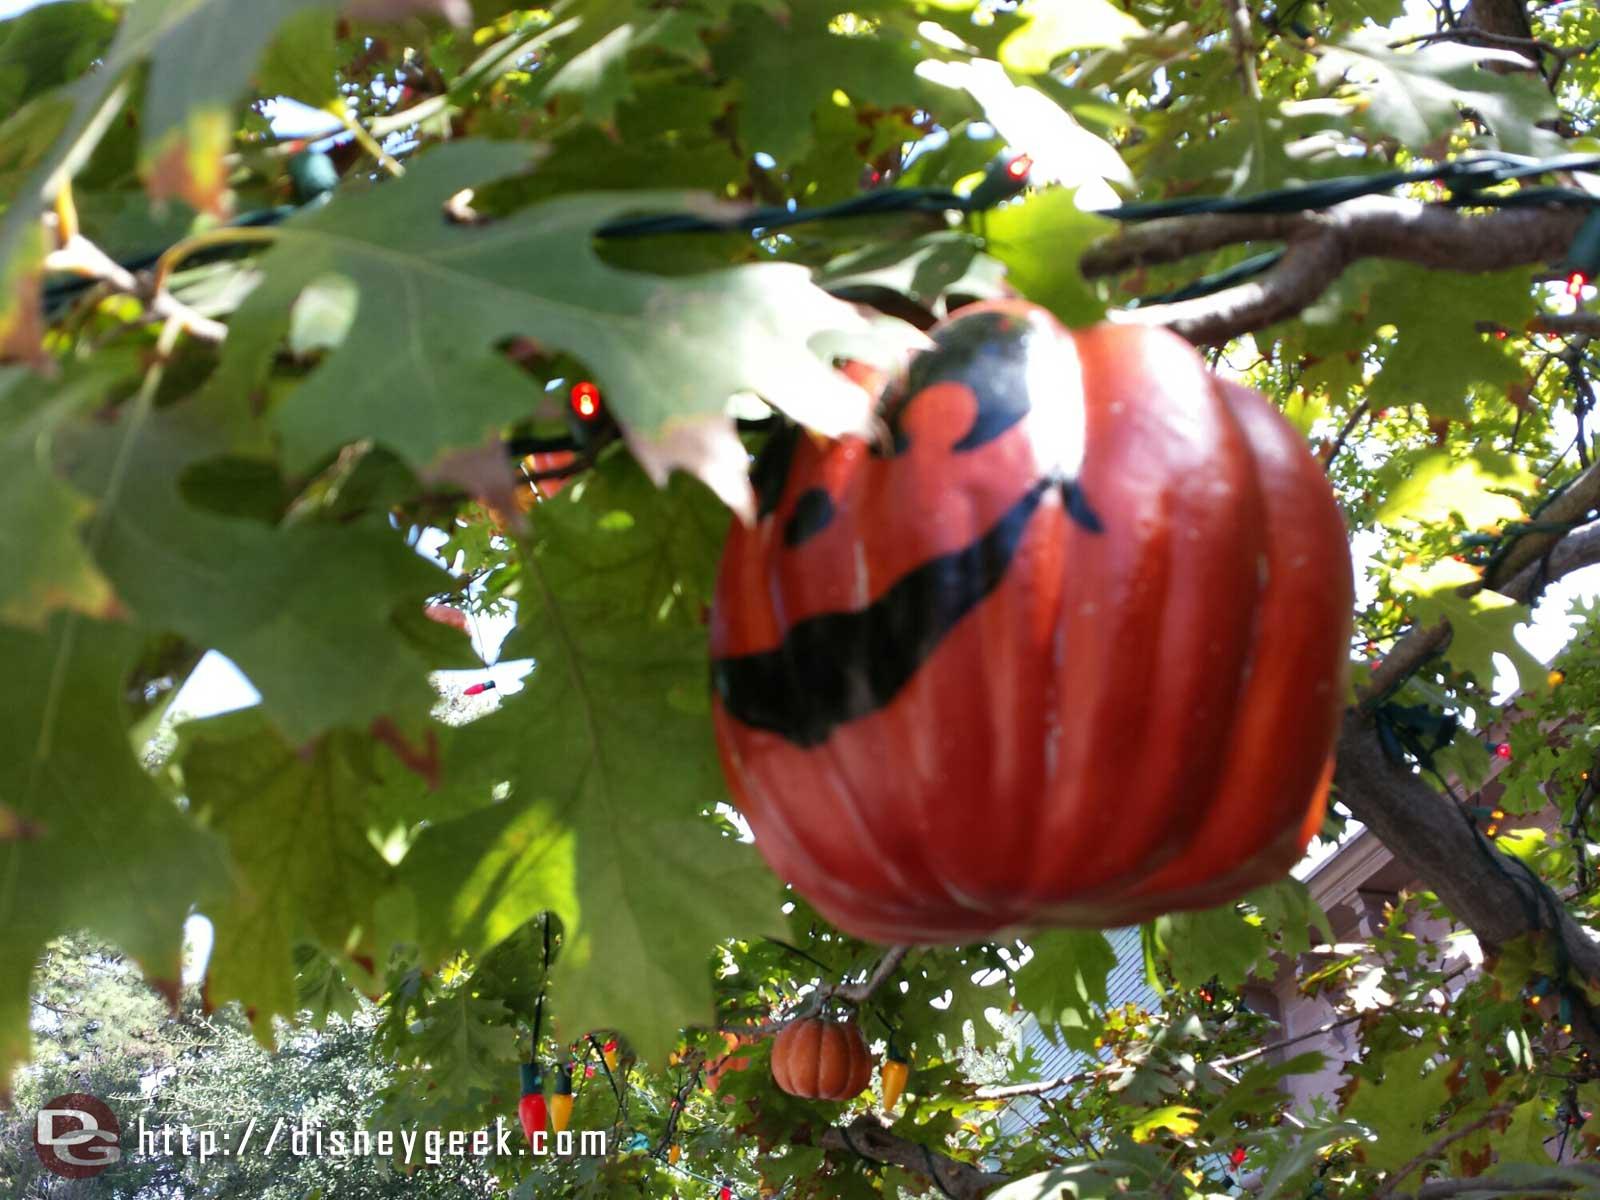 The Halloween tree has returned to Frontierland #Disneyland